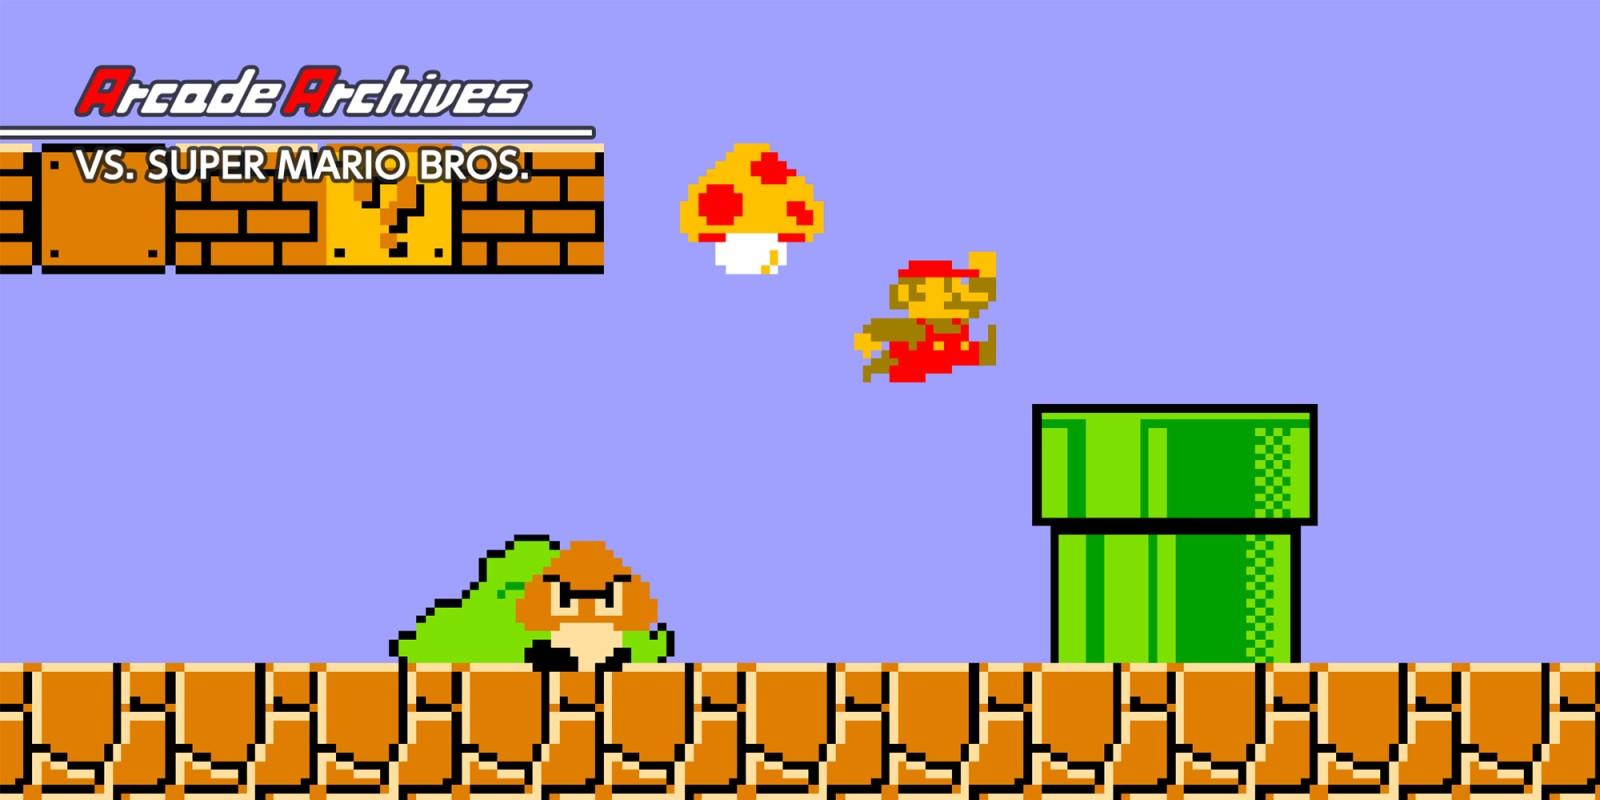 Arcade Archives VS SUPER MARIO BROS Jeux Tlcharger